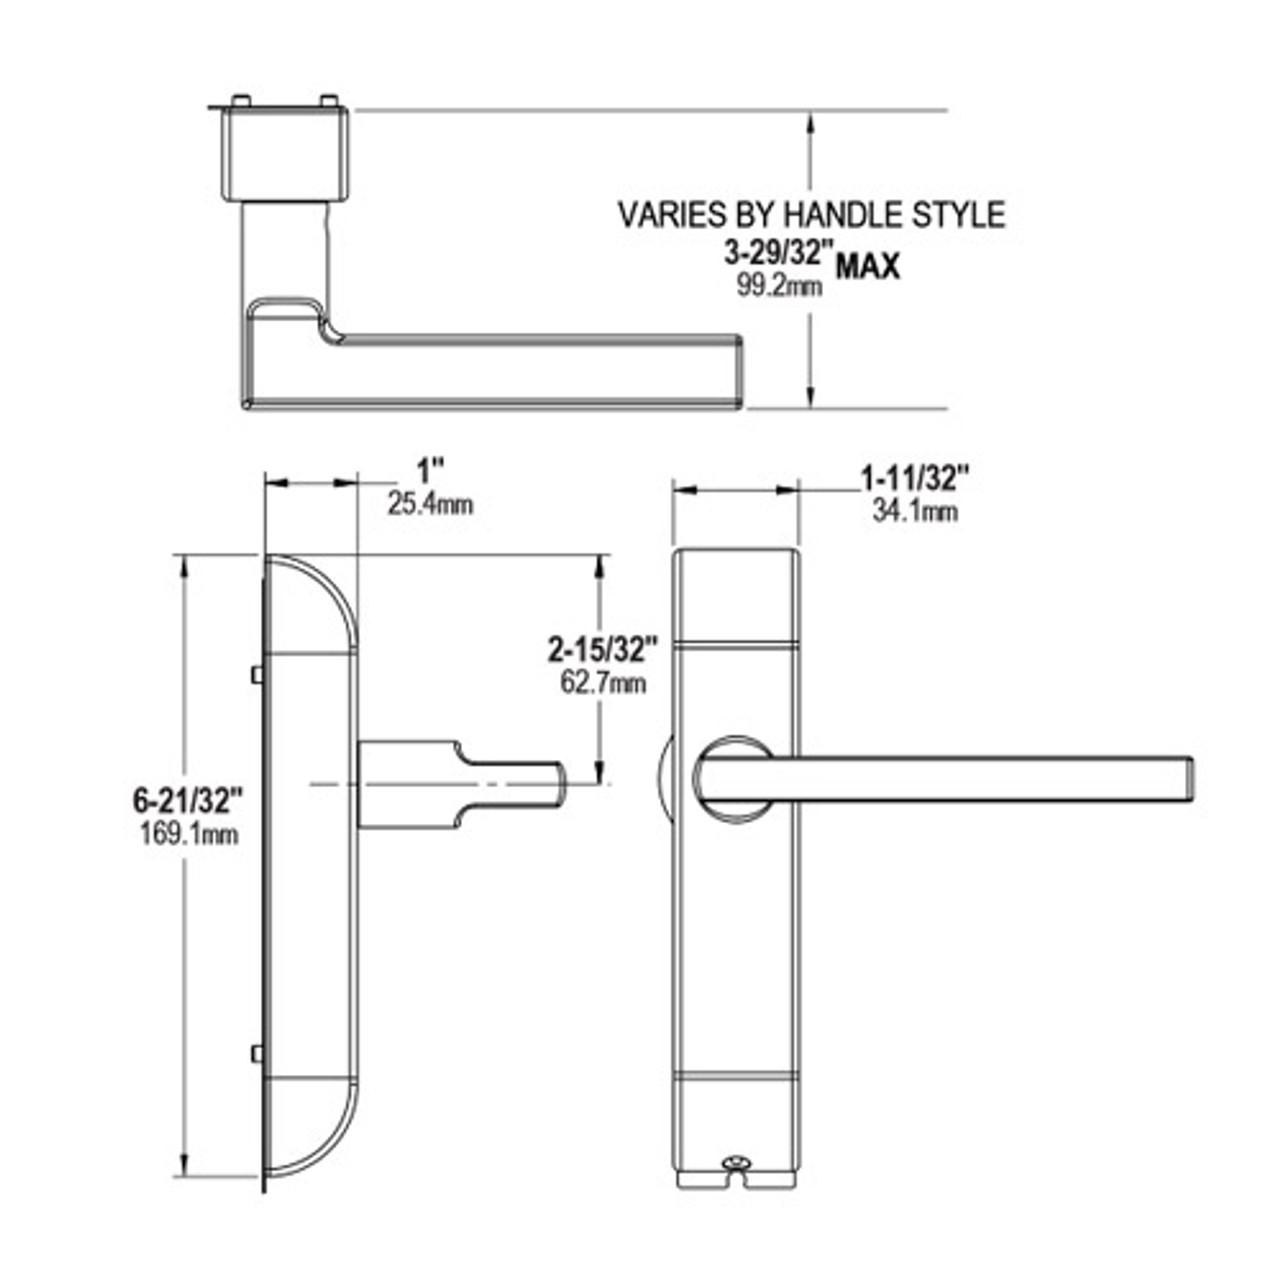 4600M-MD-612-US3 Adams Rite MD Designer handle Dimensional View